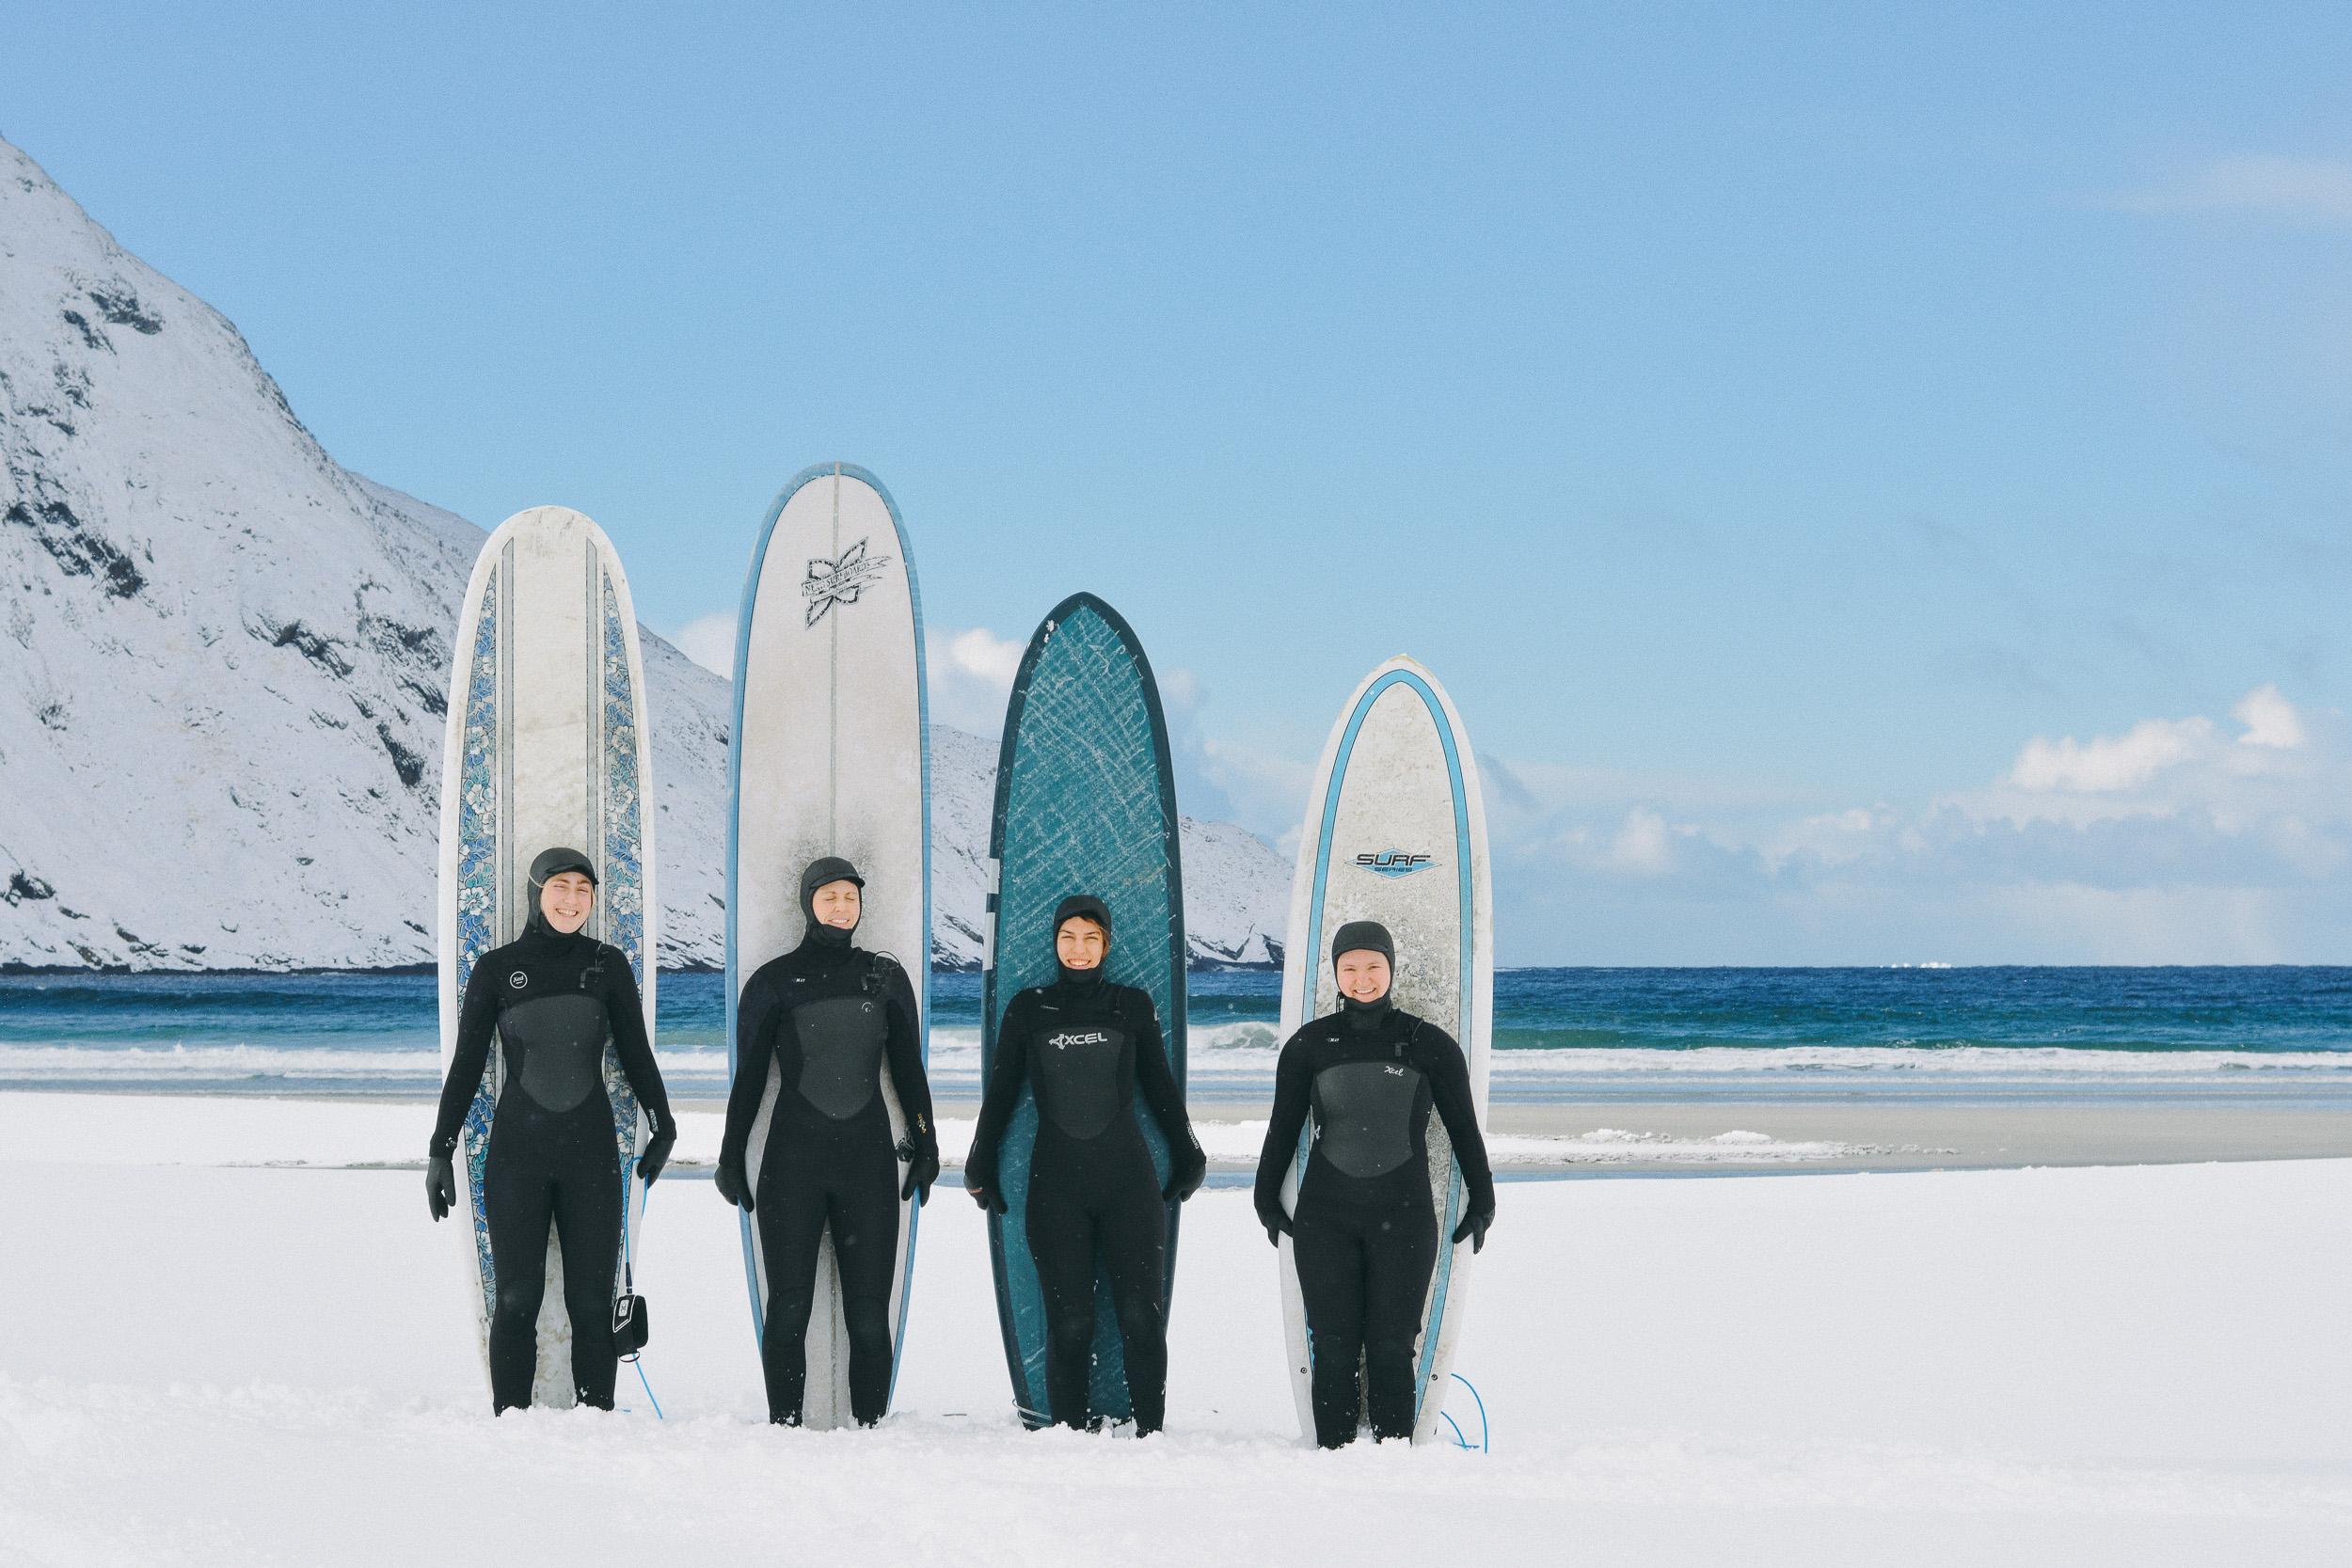 Christian-Surfers-Norway-1.jpg